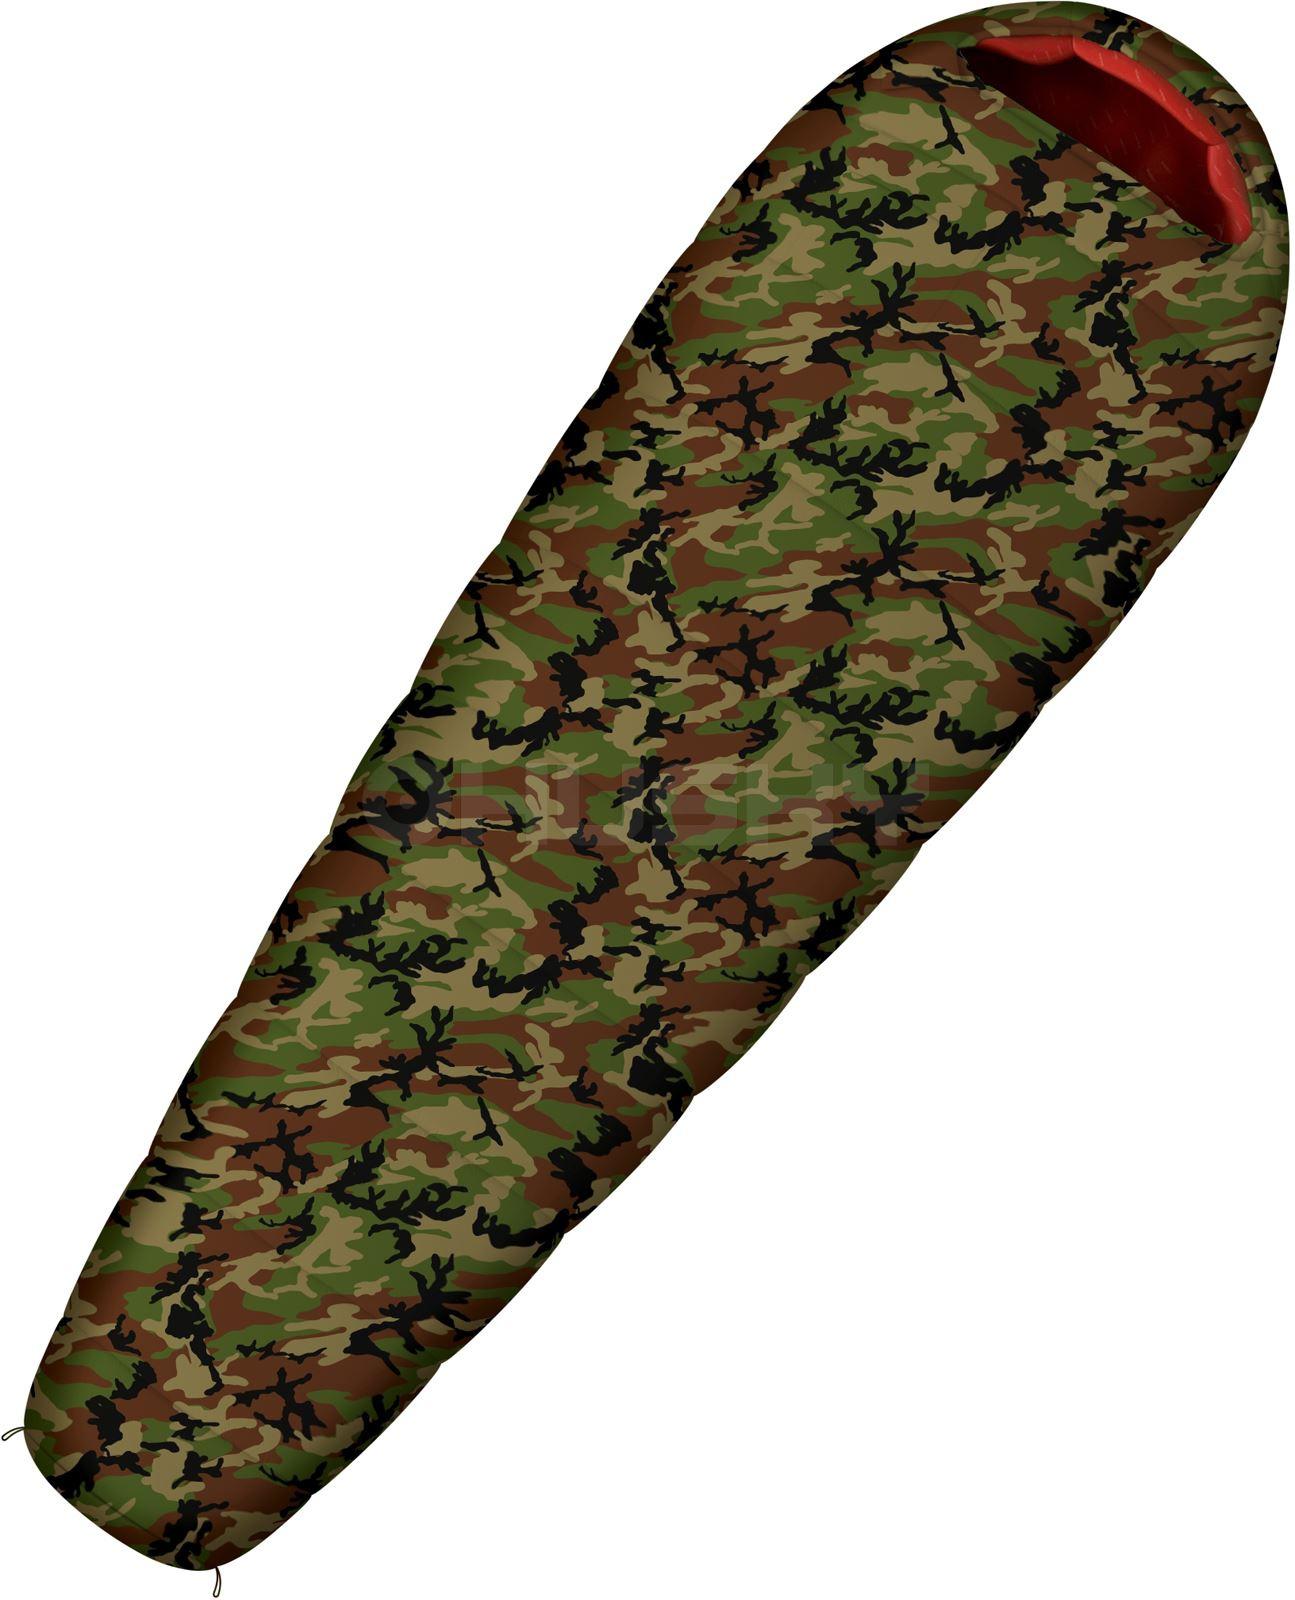 Spacák Outdoor Army -17°C khaki